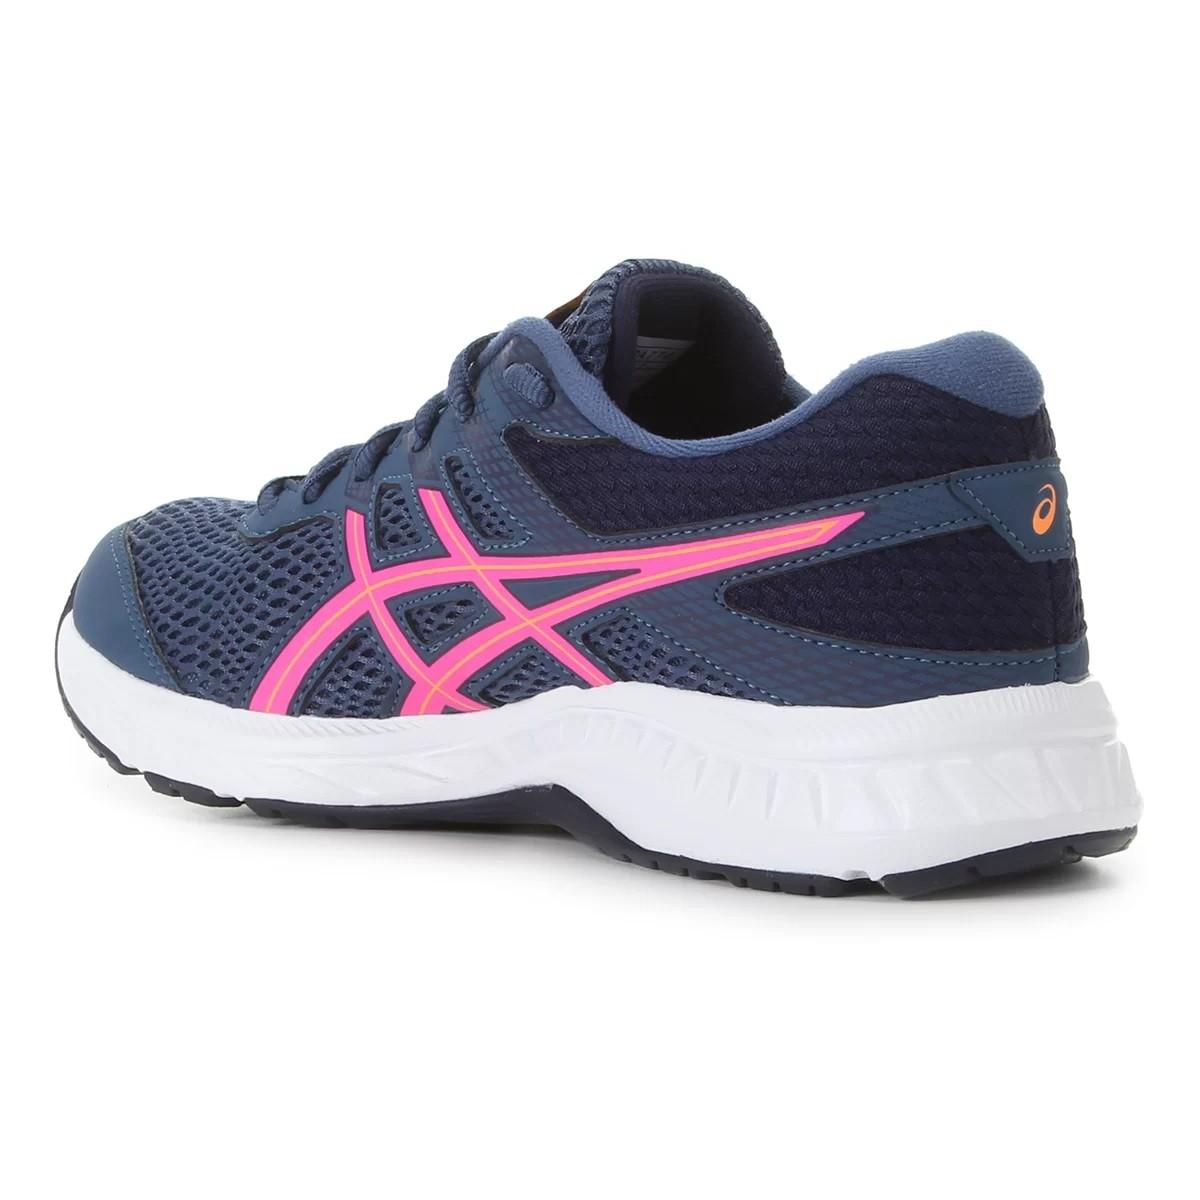 Tênis Asics Gel Contend 6 Feminino Azul e Pink